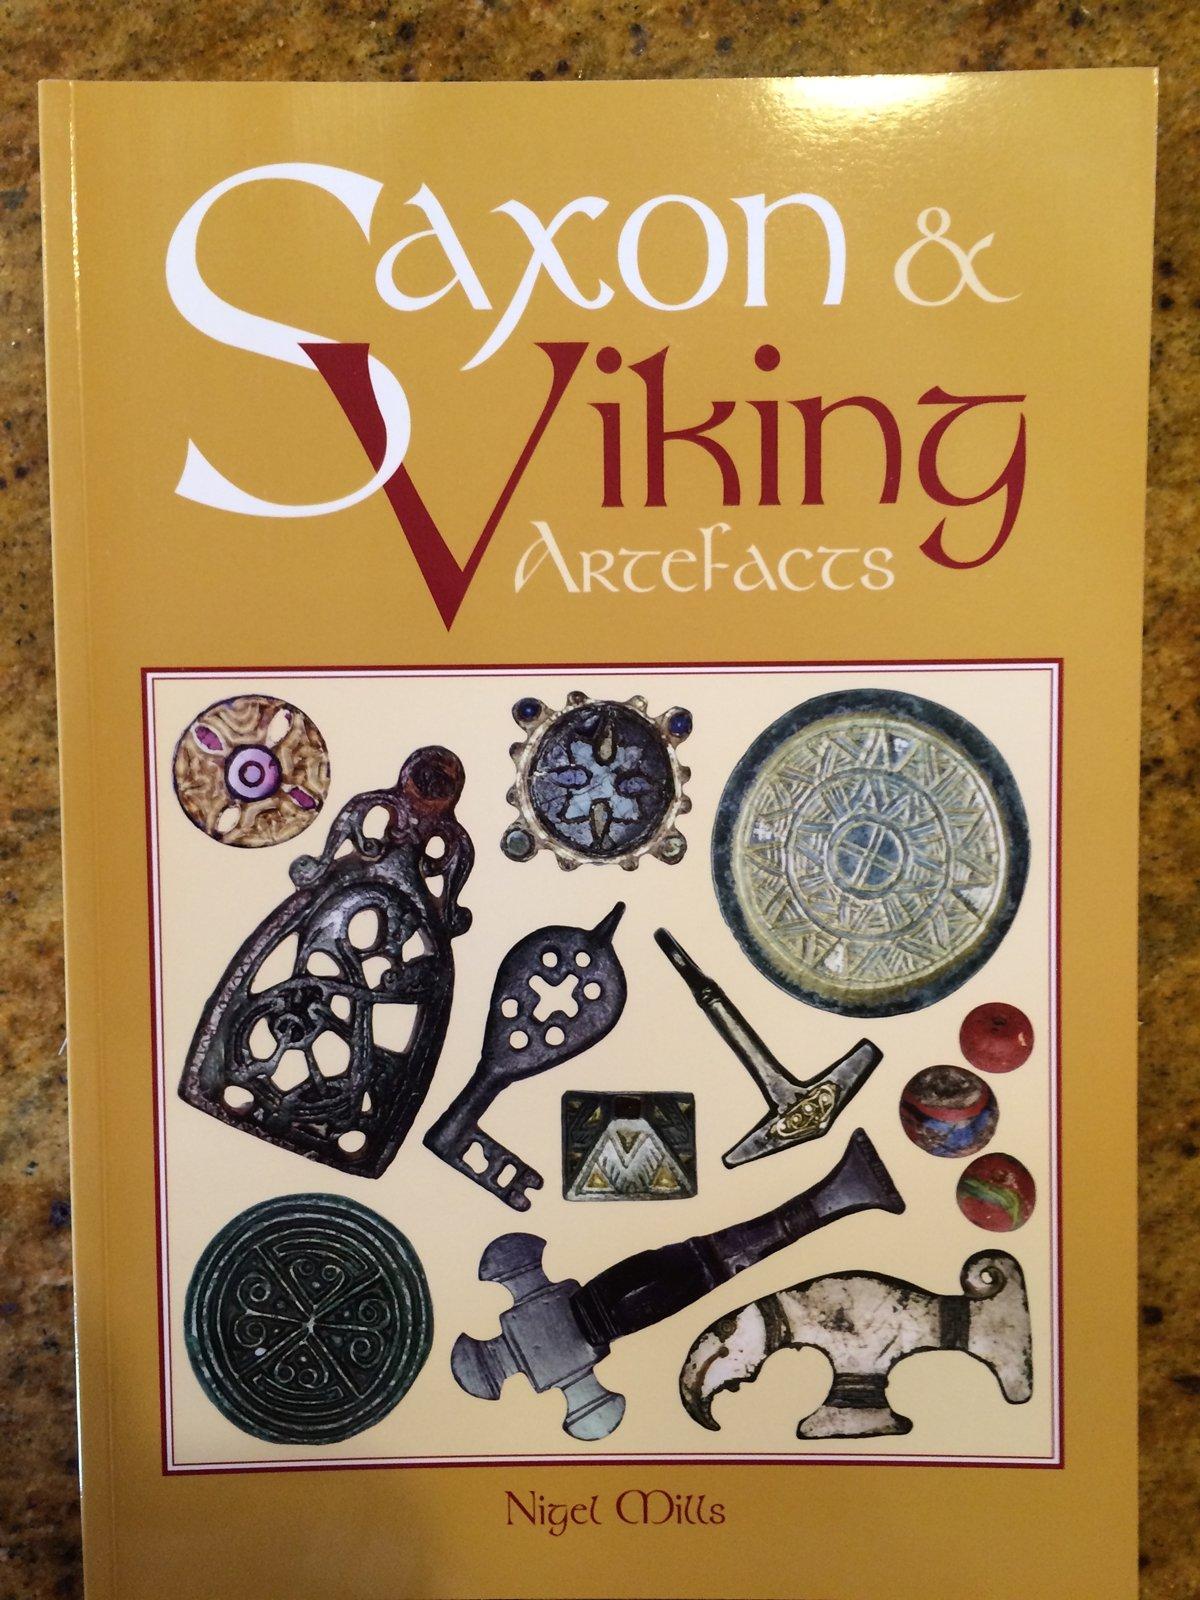 Saxon and Viking Artefacts: Amazon.es: Nigel Mills, Greg Payne: Libros en idiomas extranjeros